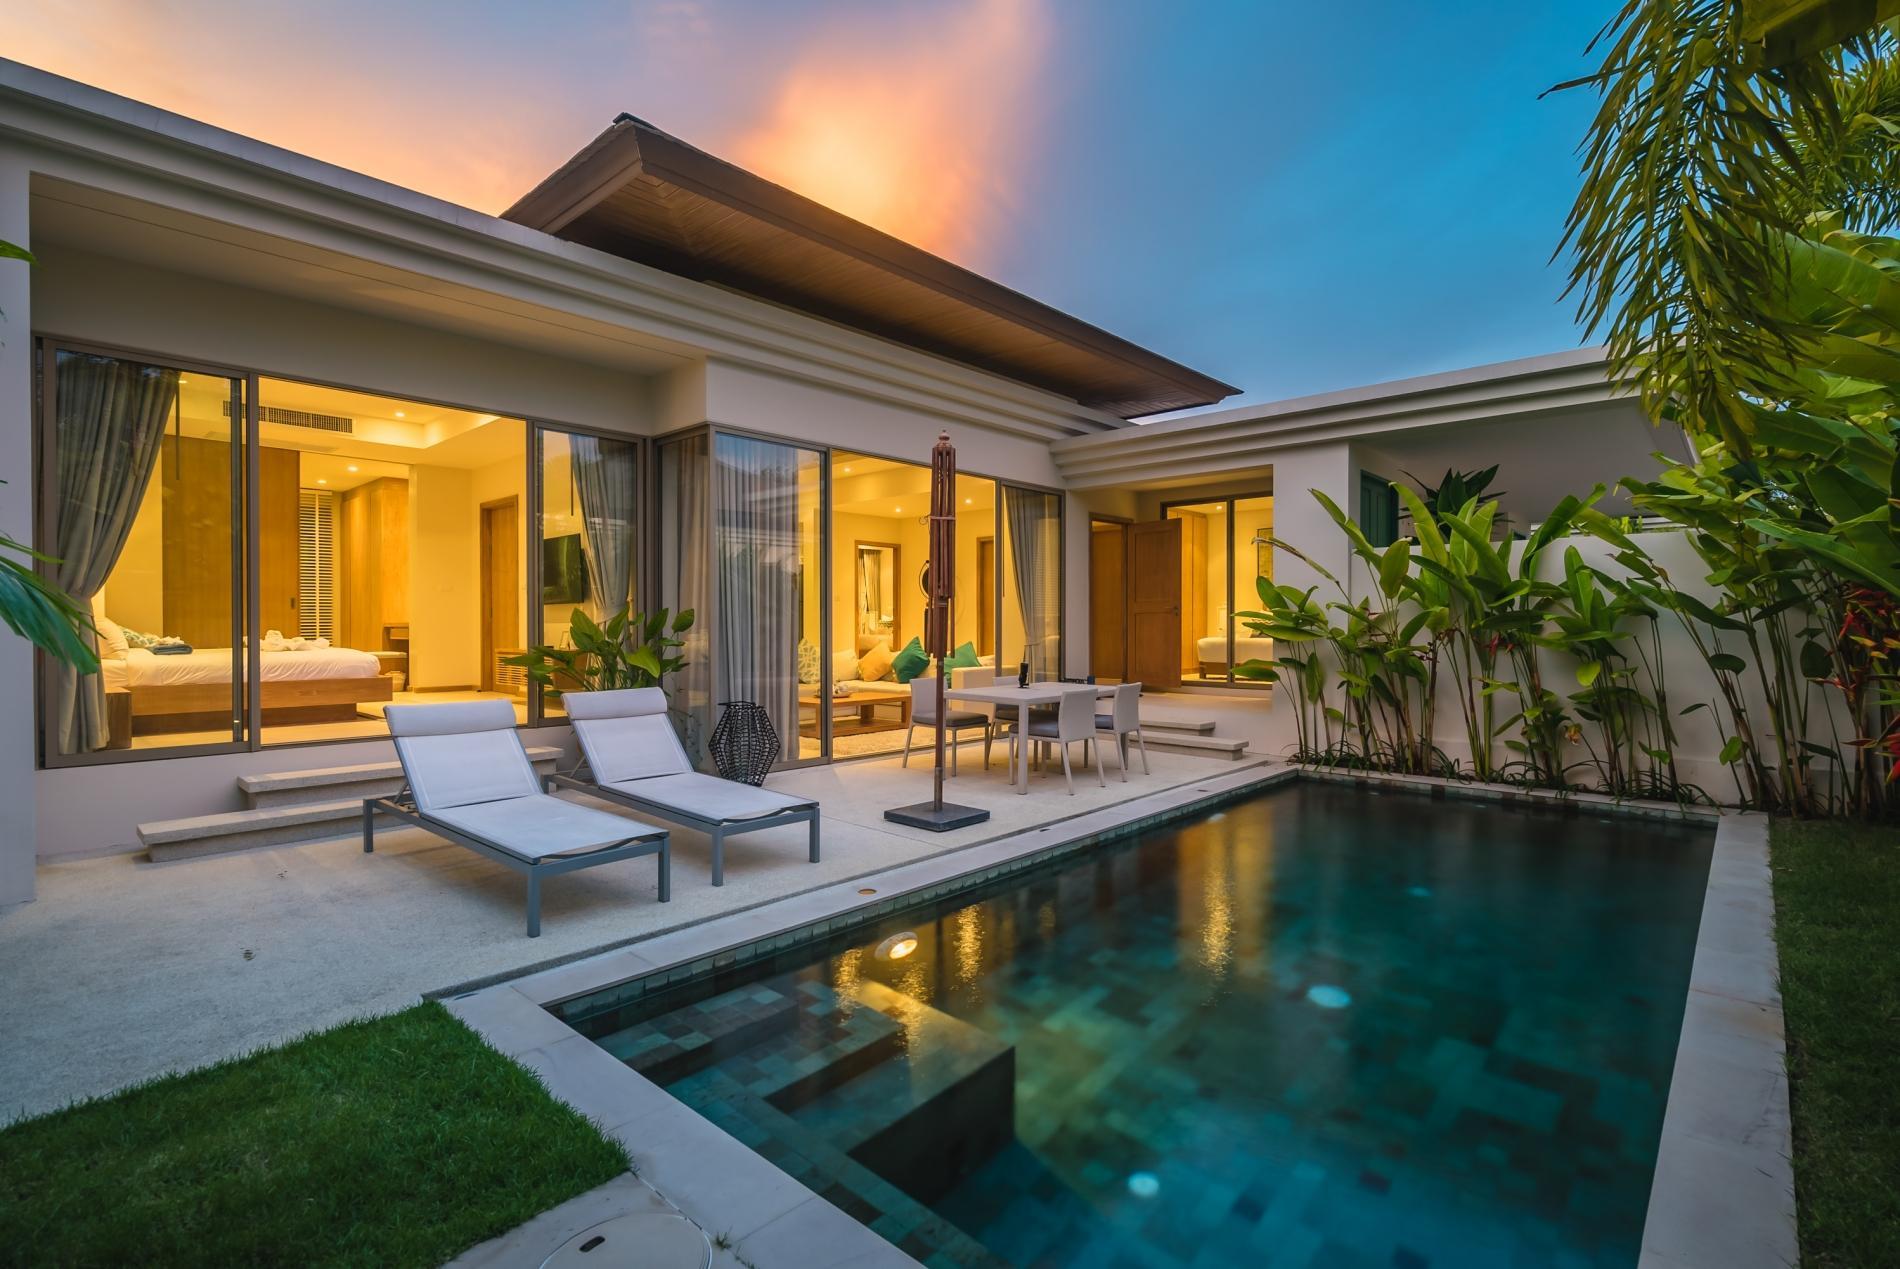 Apartment Trichada 18 - Private pool modern 3 bedroom villa photo 18547938